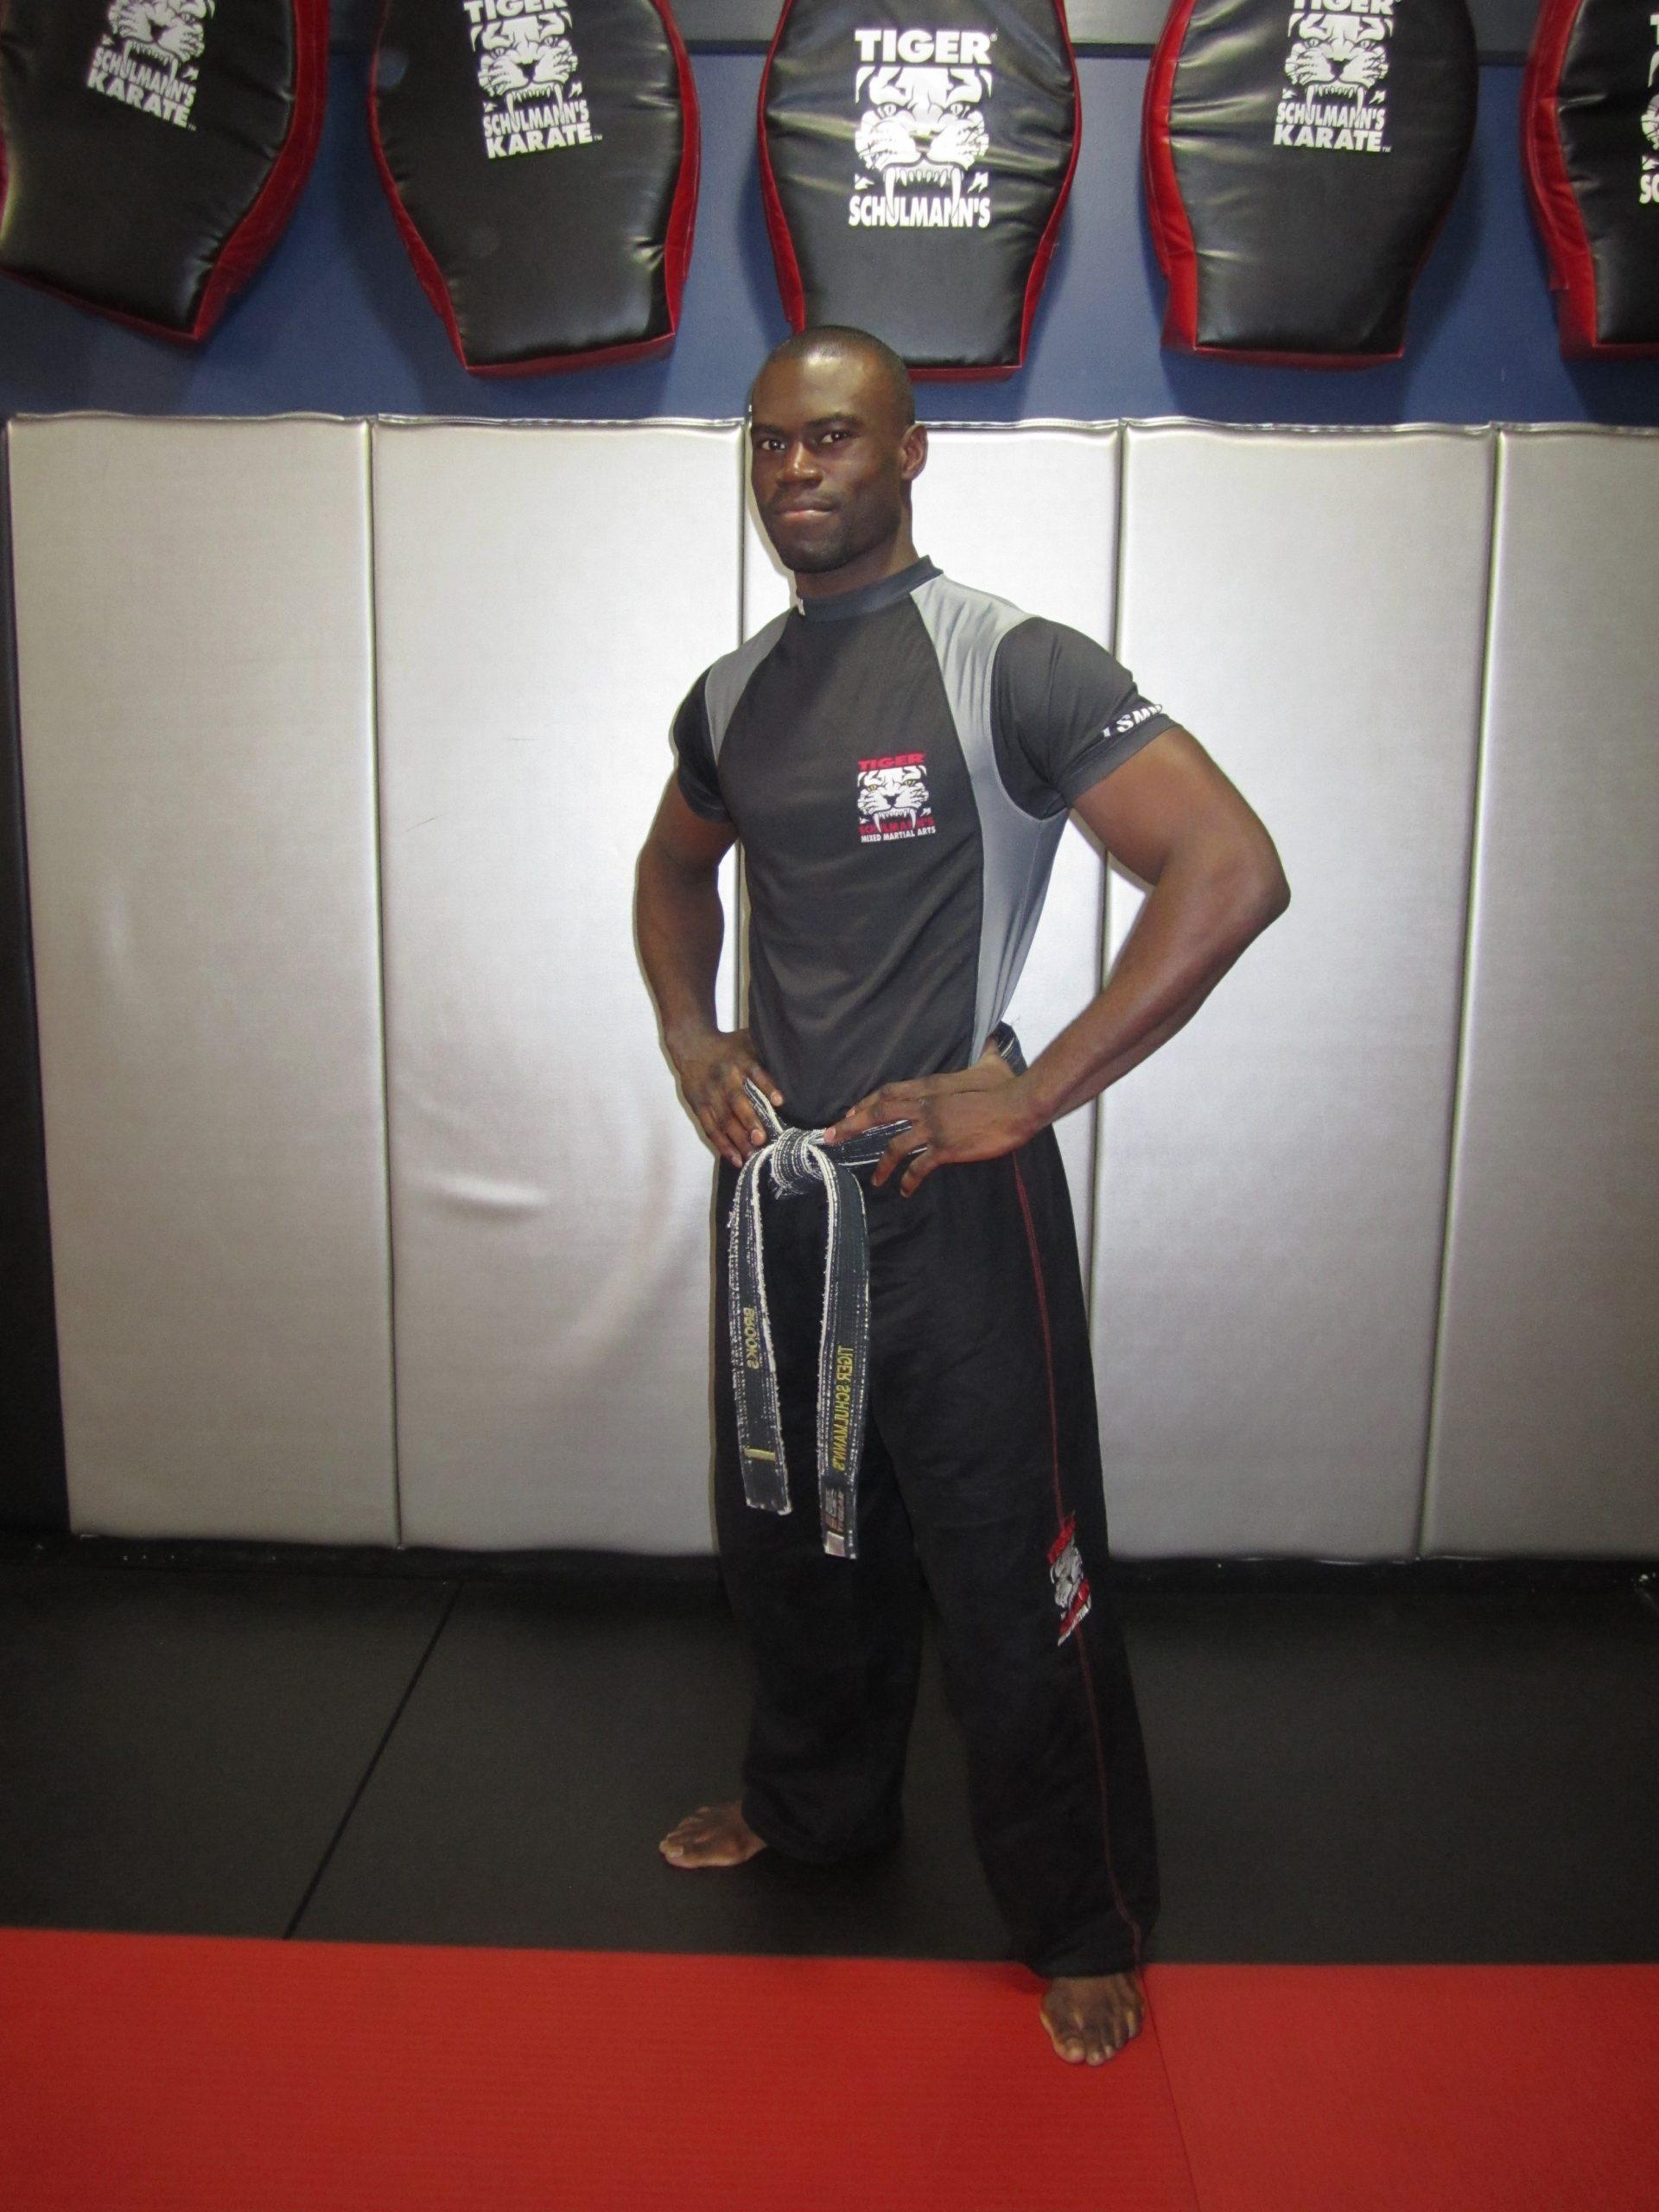 Tiger Schulmann's Martial Arts | Man Standing